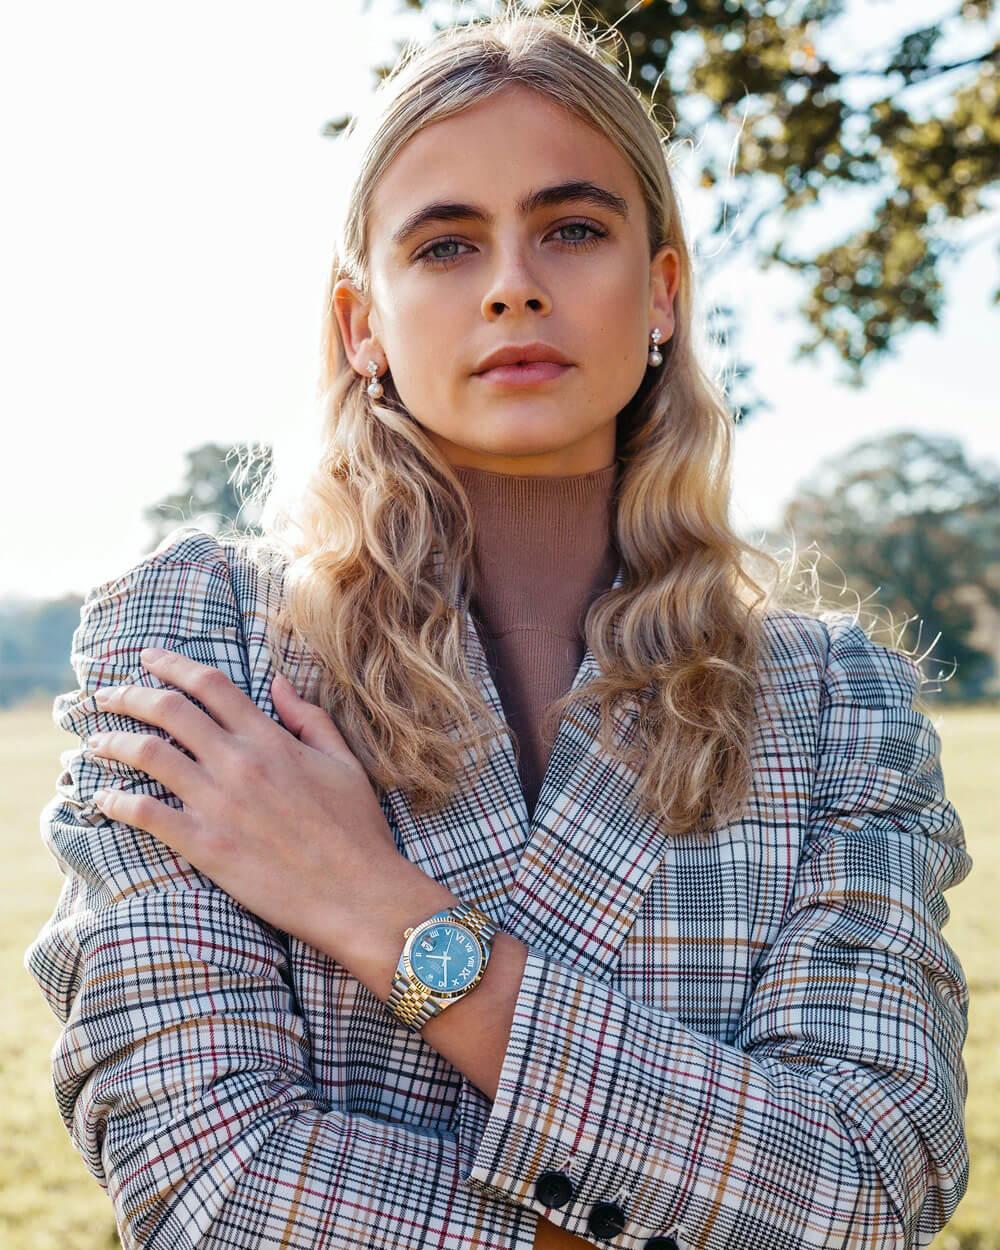 Rolex - Top fashion brands of 2021